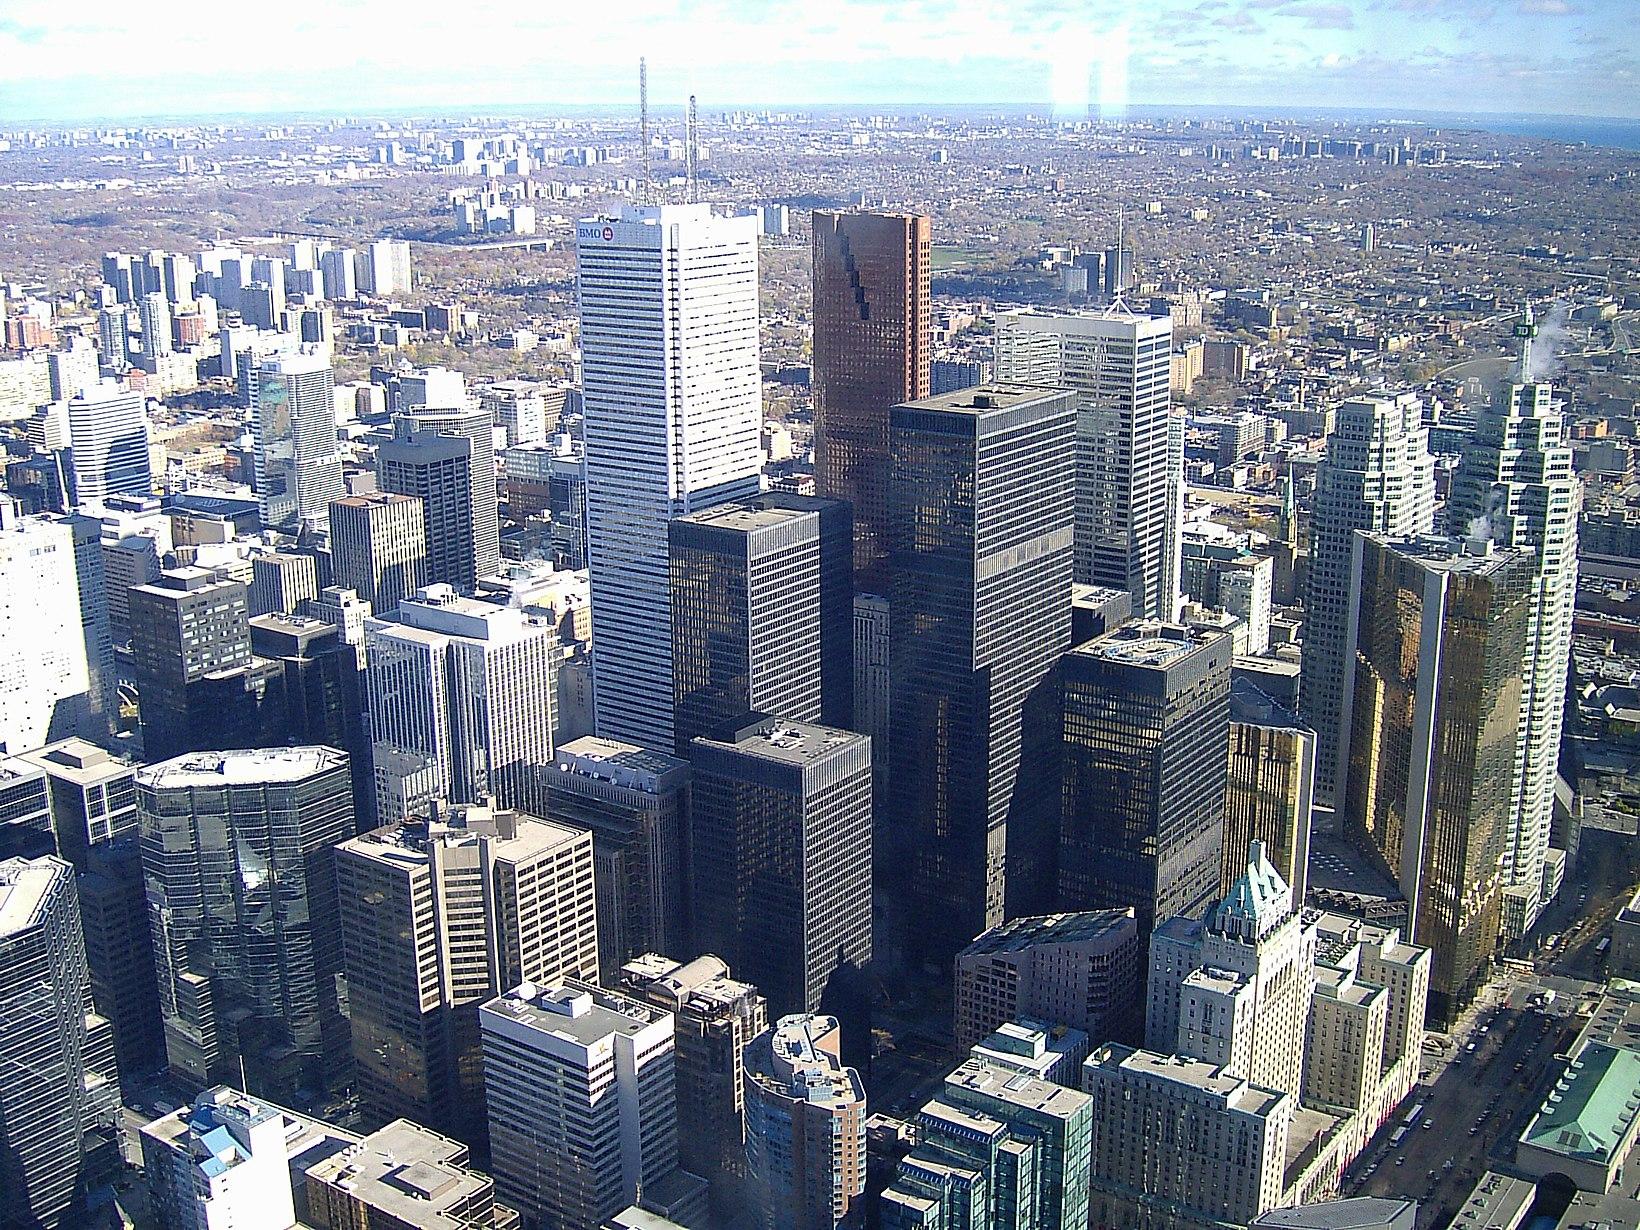 siti di incontri Sault Ste Marie Ontario